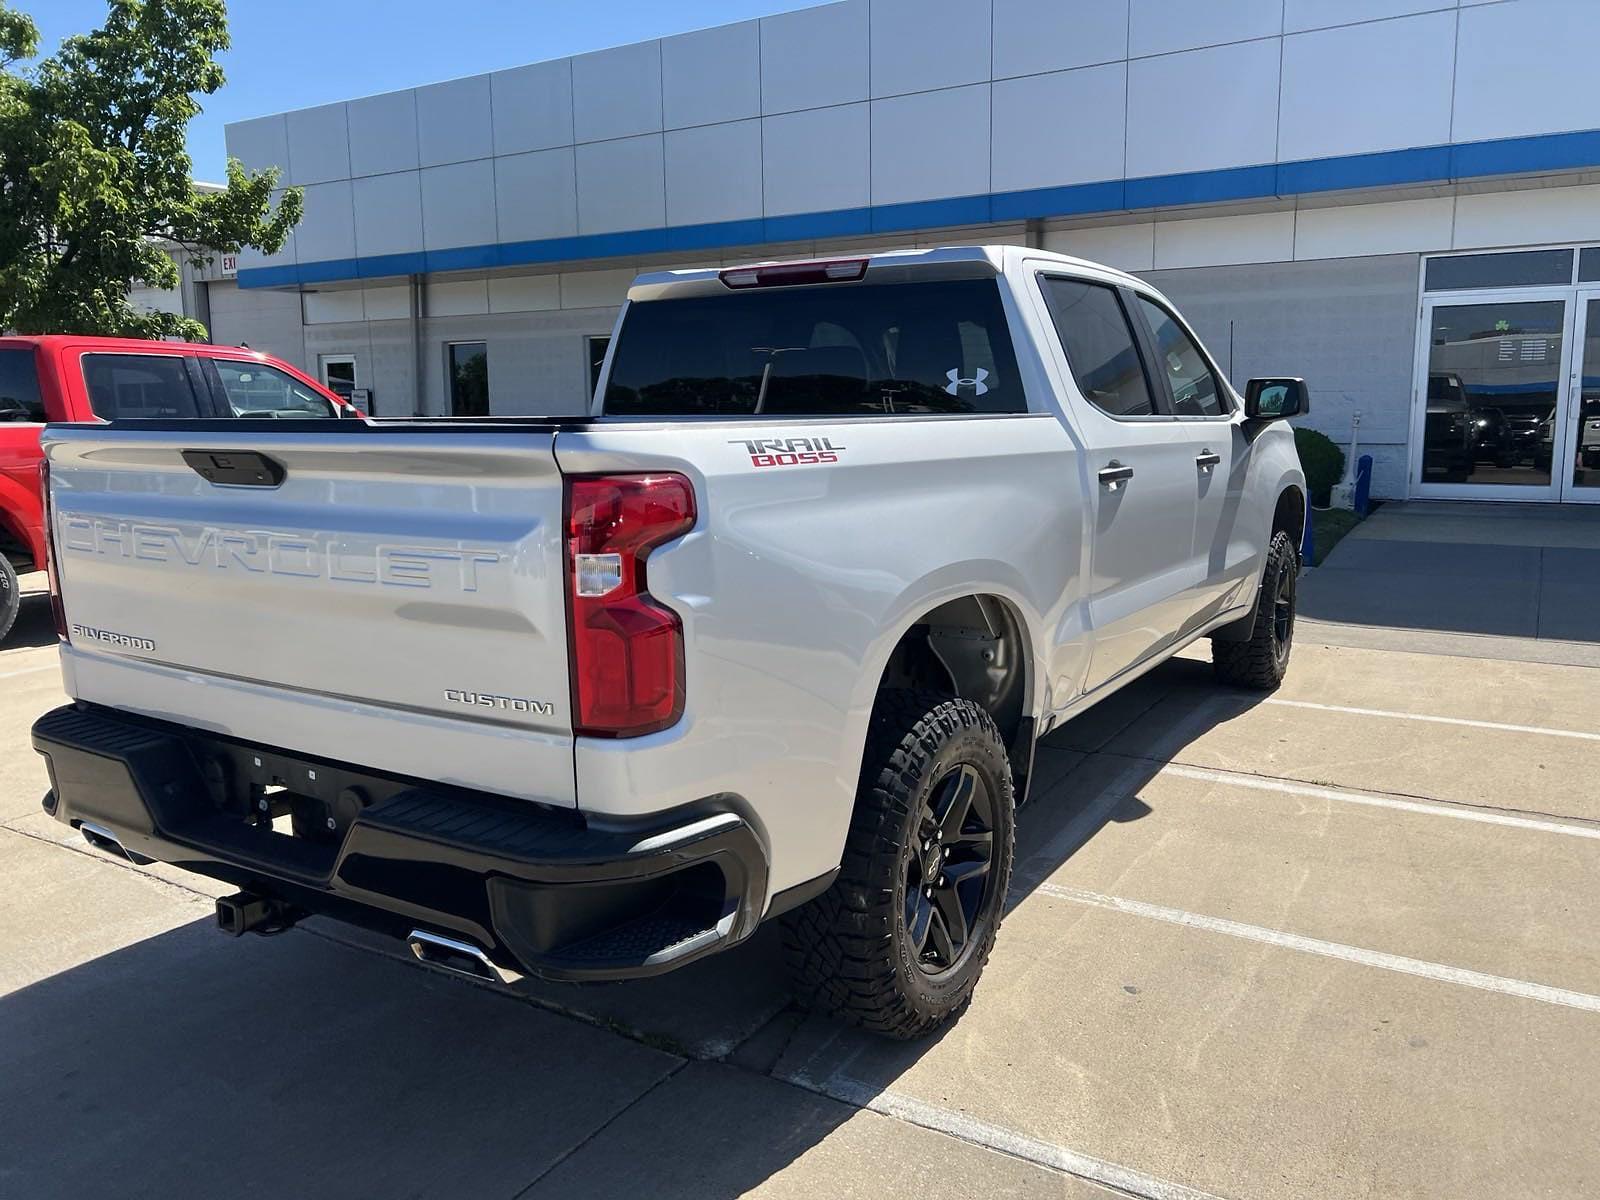 2020 Chevrolet Silverado 1500 Crew Cab 4x4, Pickup #C201626 - photo 3